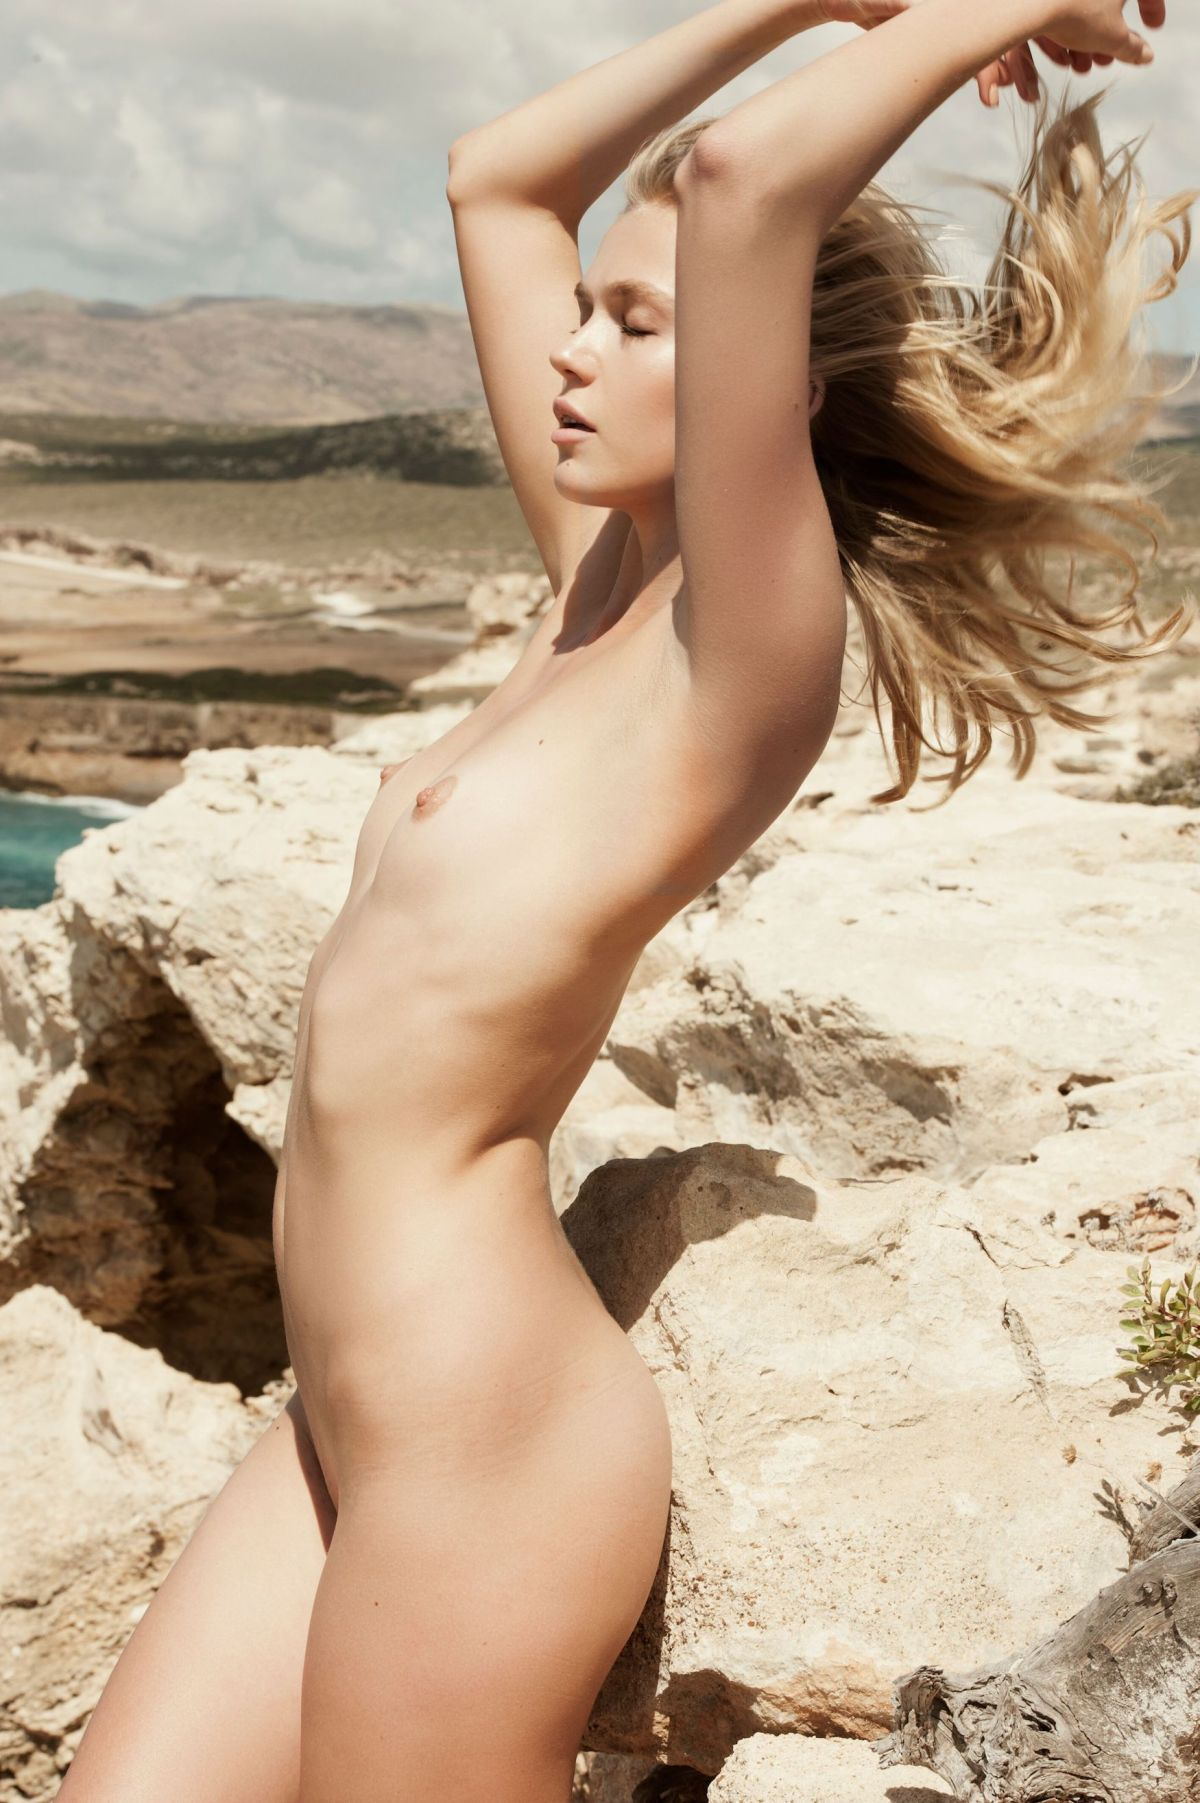 Stefan Imielski - Nudes In Nature